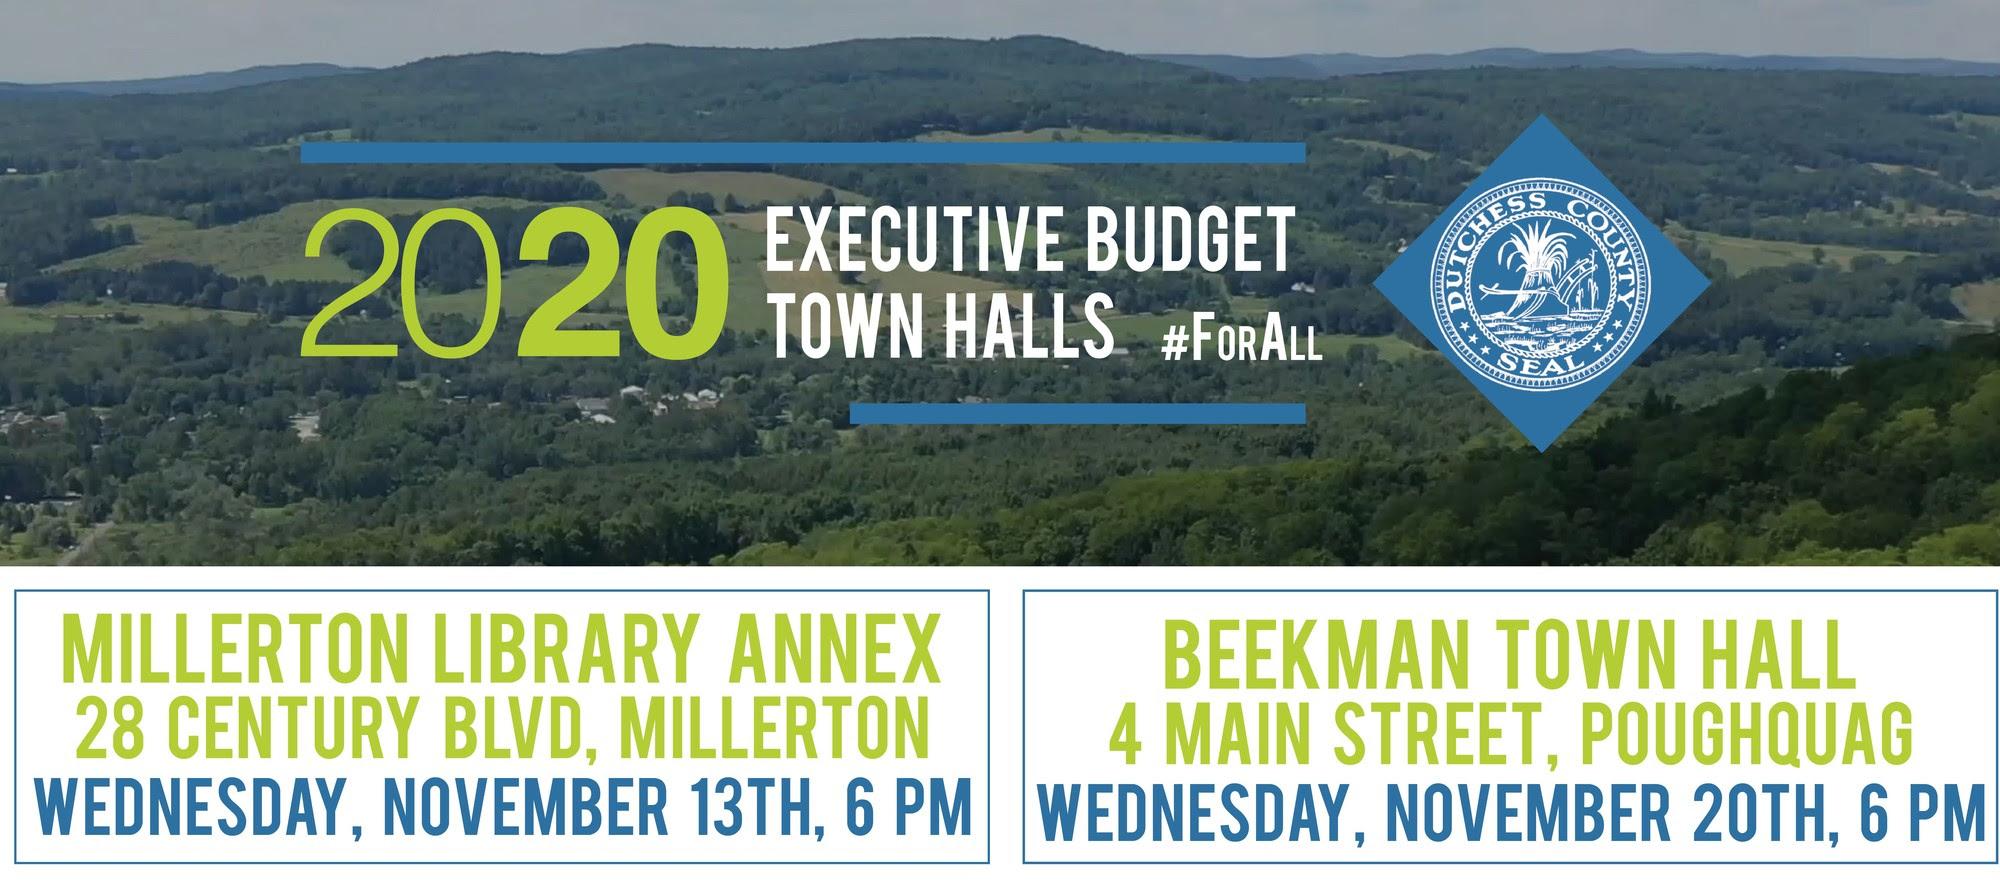 2020 Budget Town Halls information